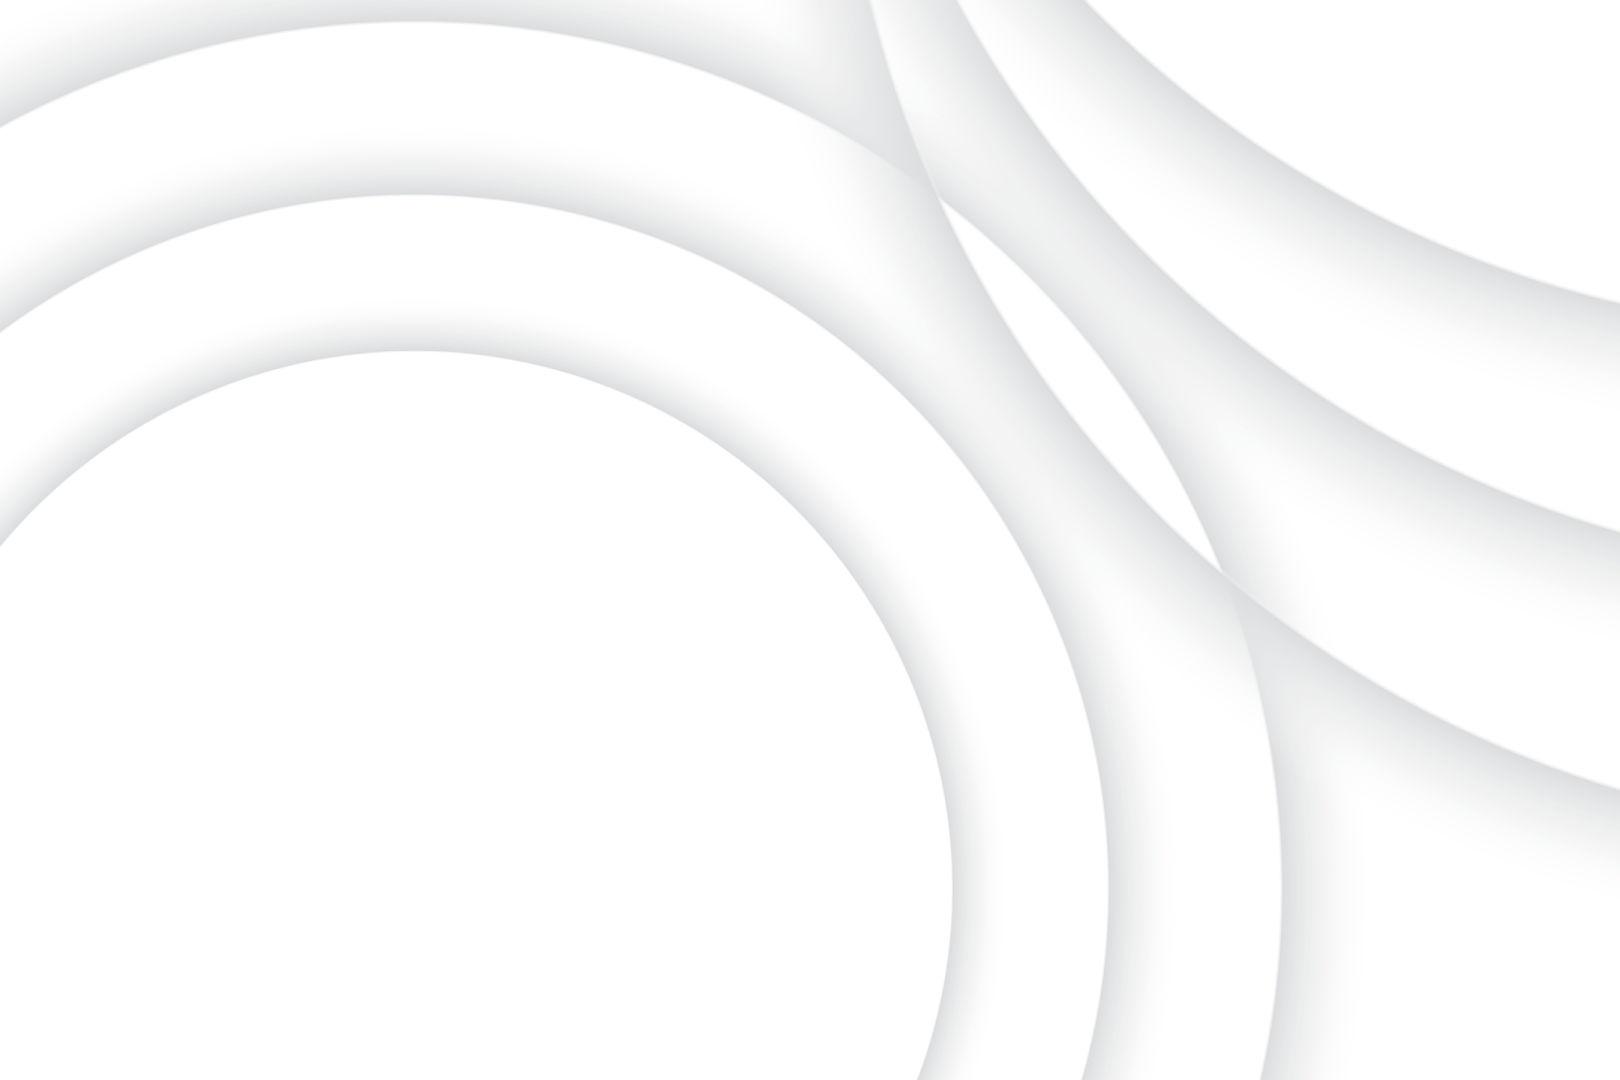 https://dotenable.com/dir/wp-content/uploads/2021/01/Alternate-Background-2_opt-1.jpg